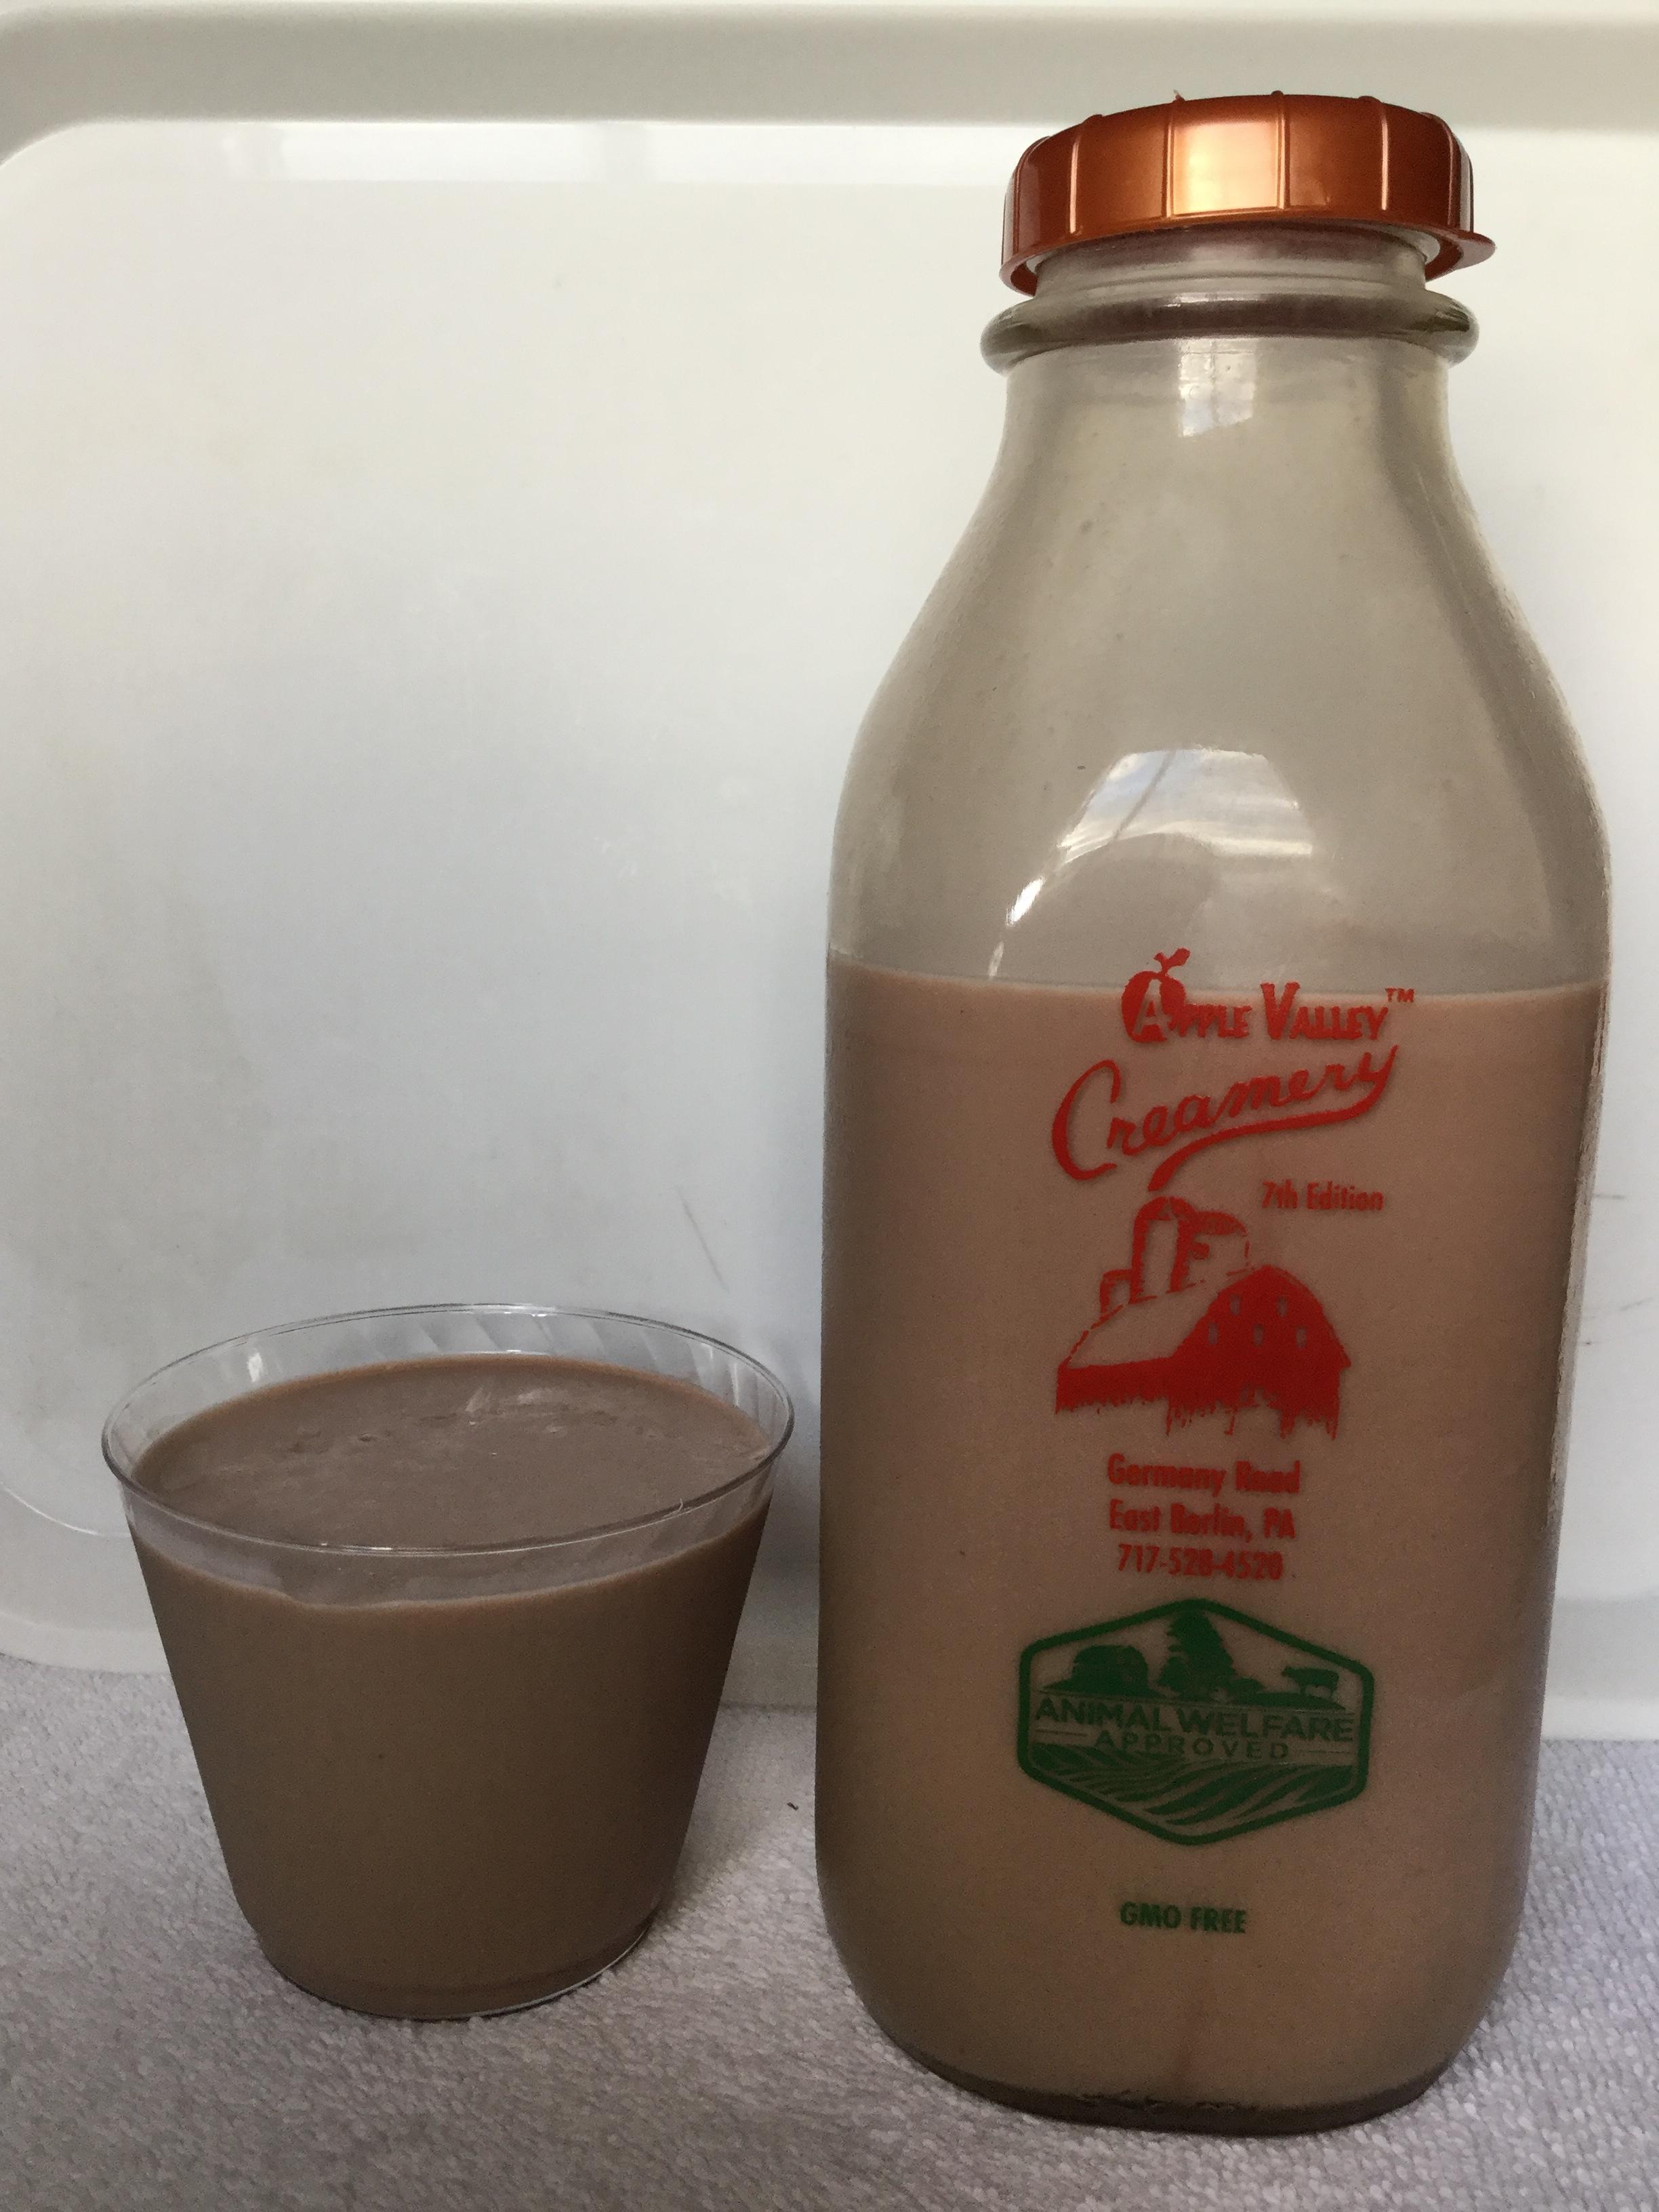 Apple Valley Creamery Chocolate Milk Cup